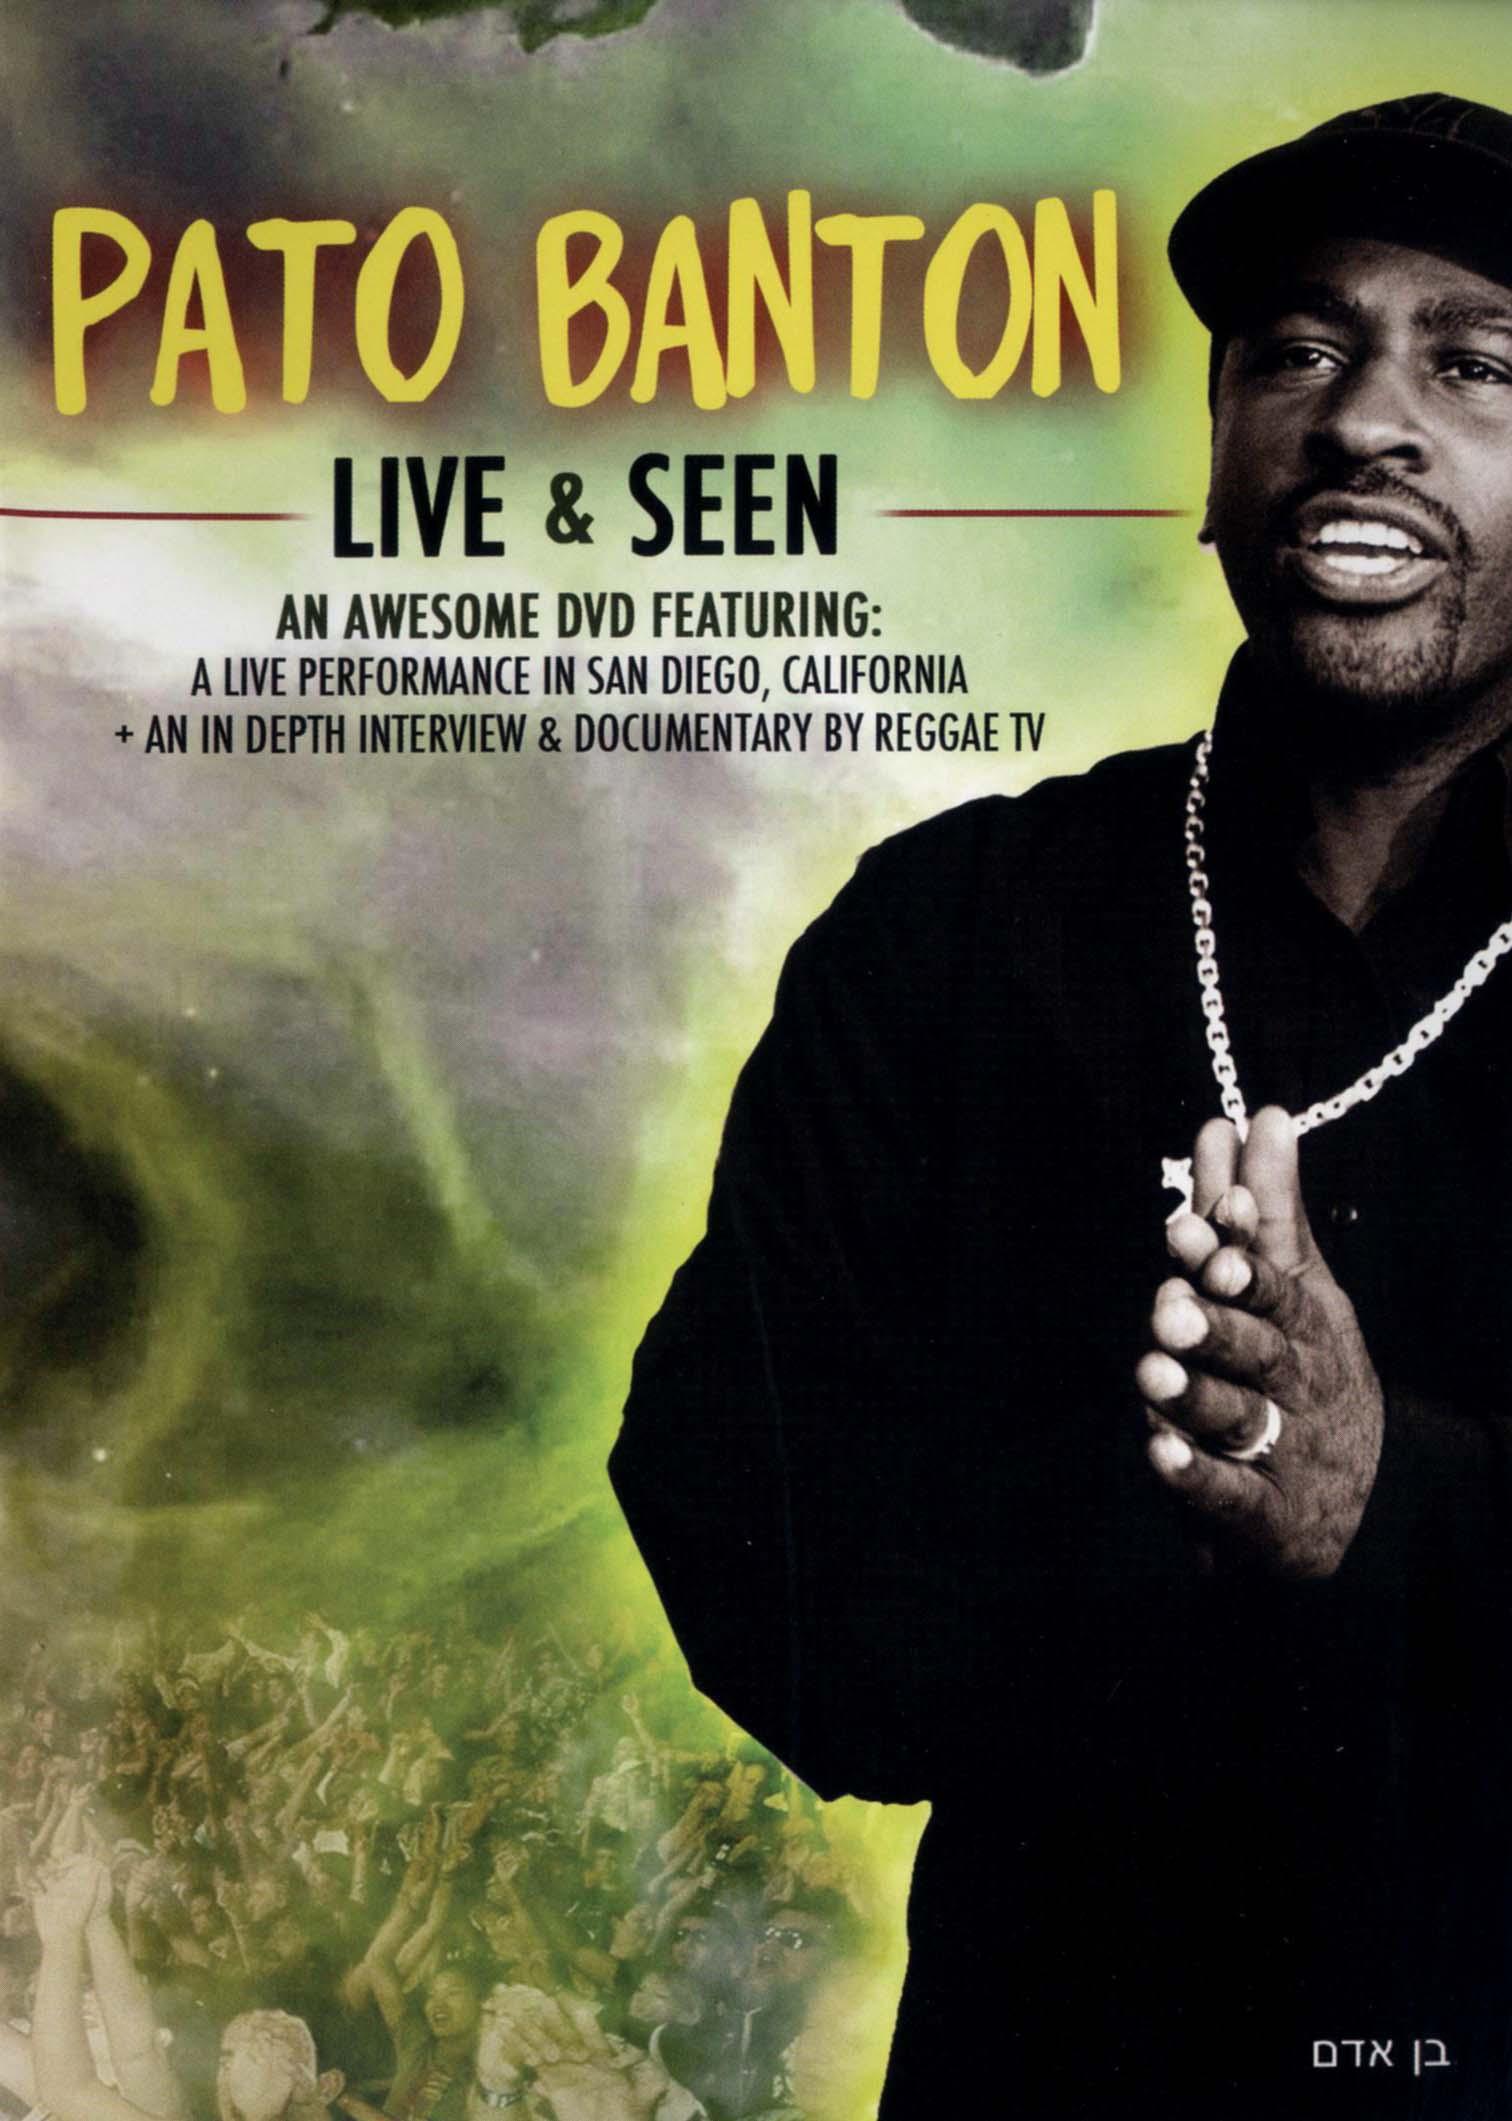 Pato Banton: Live and Seen